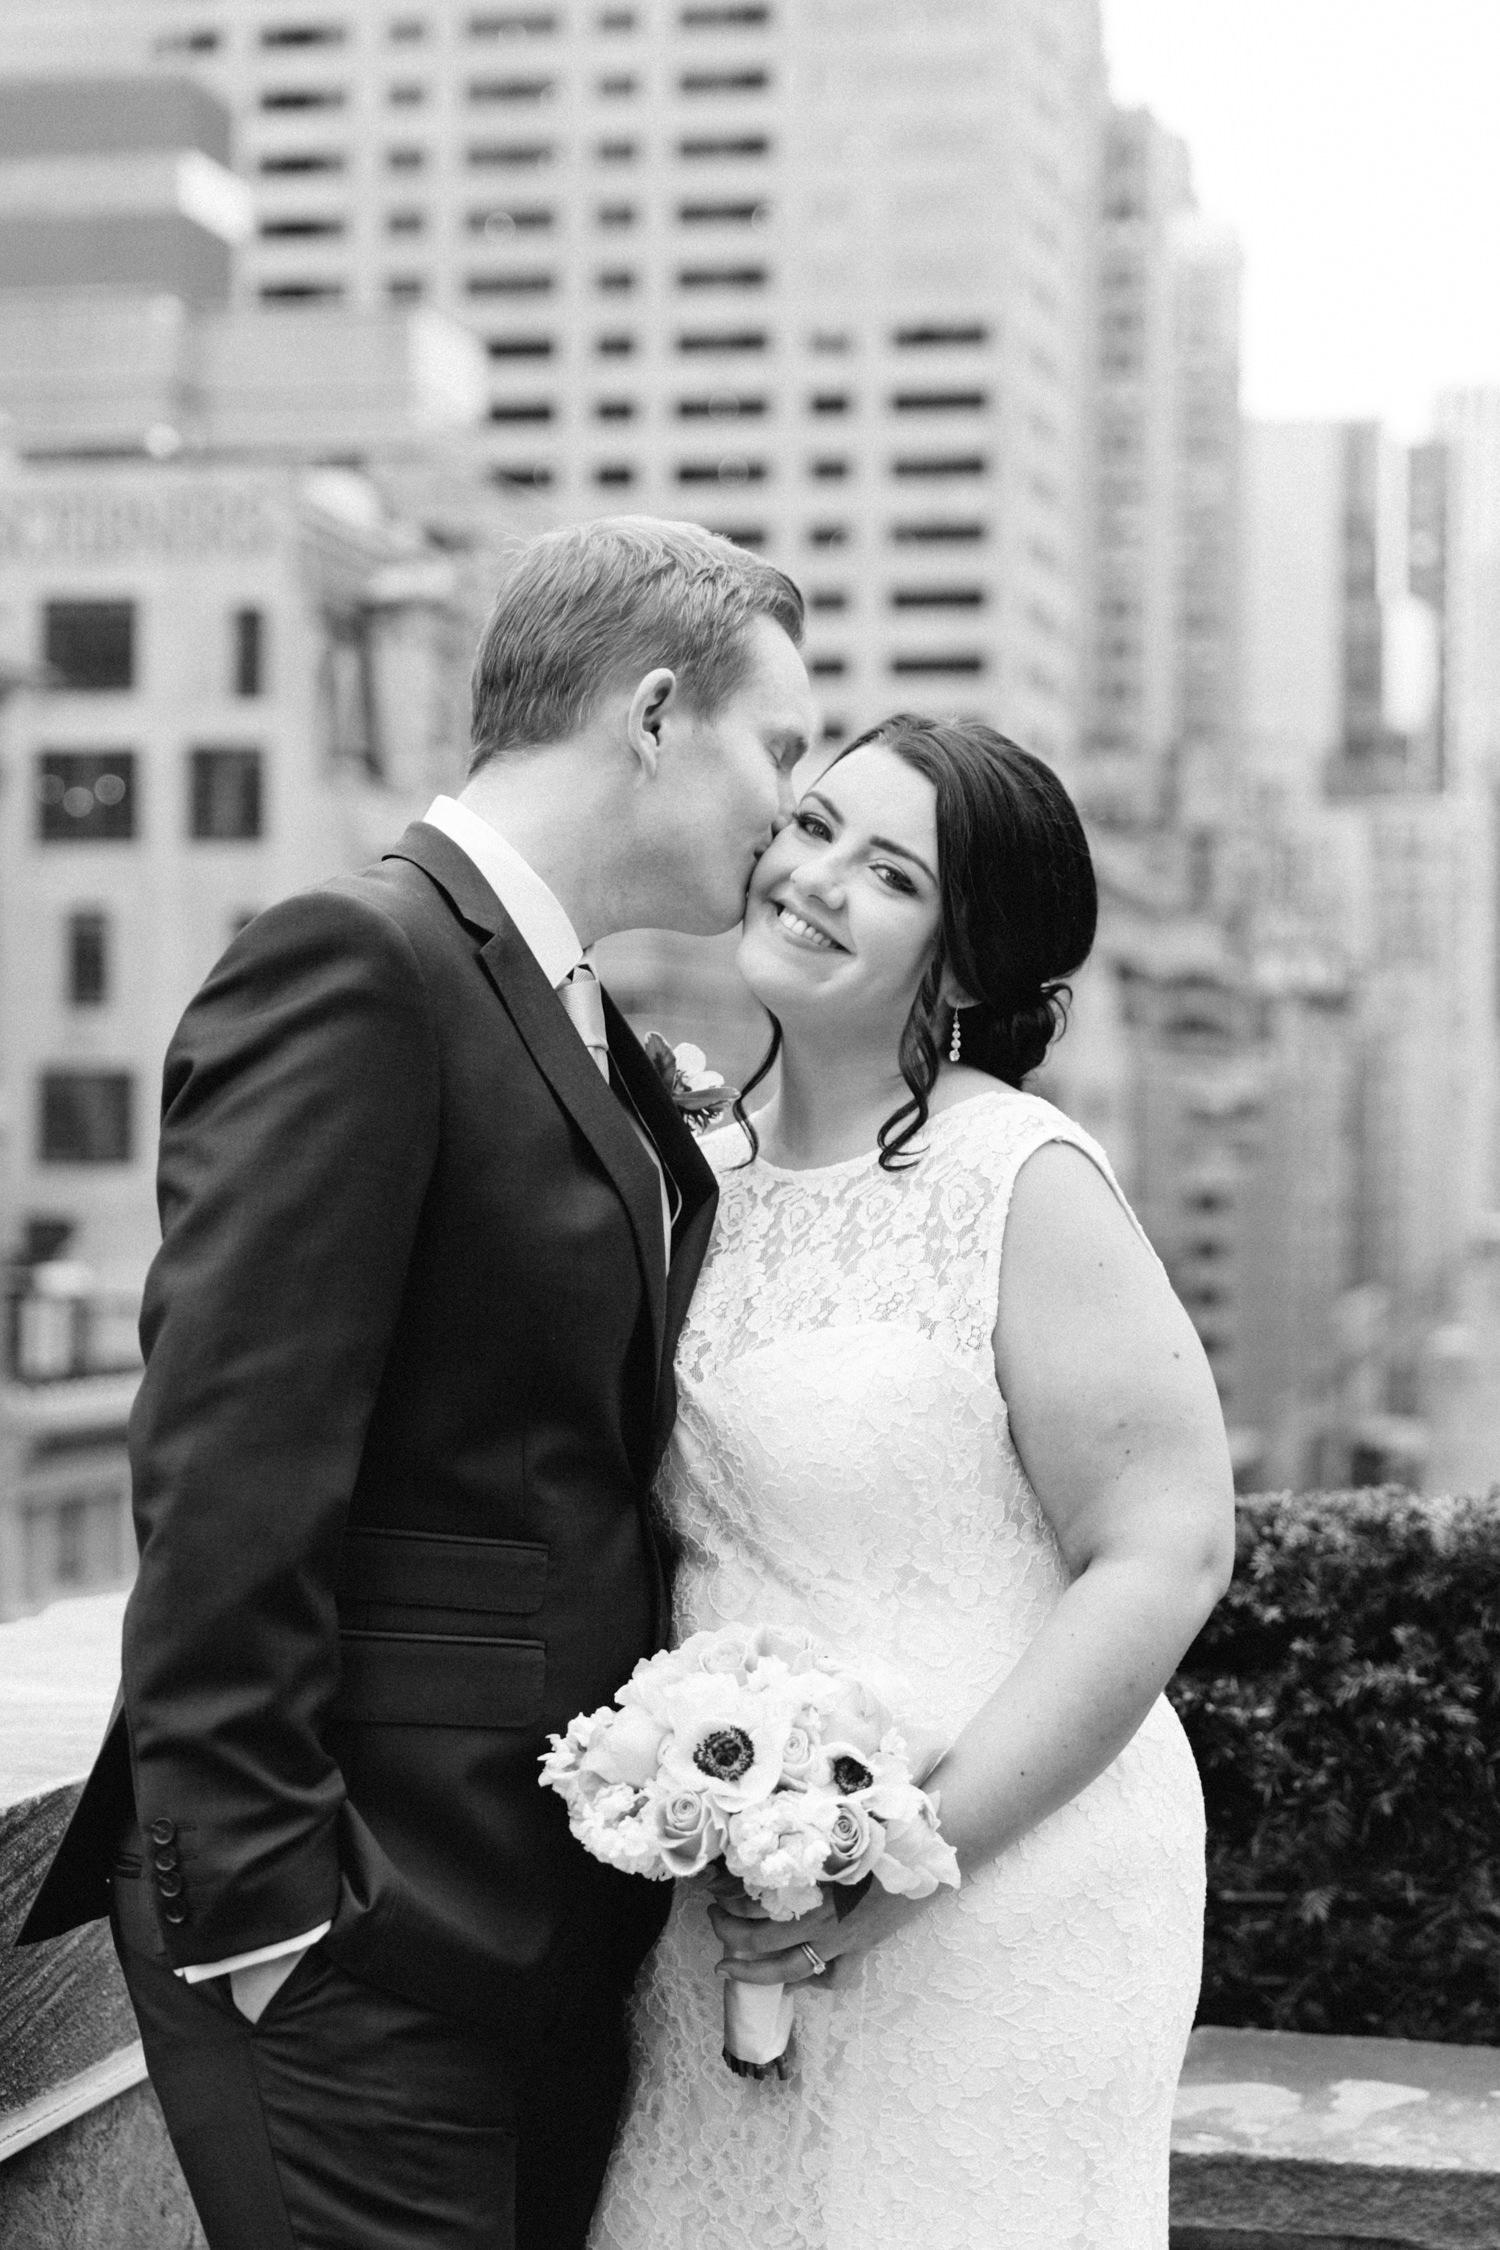 620-loft&garden-intimate-wedding-J&A-97.jpg